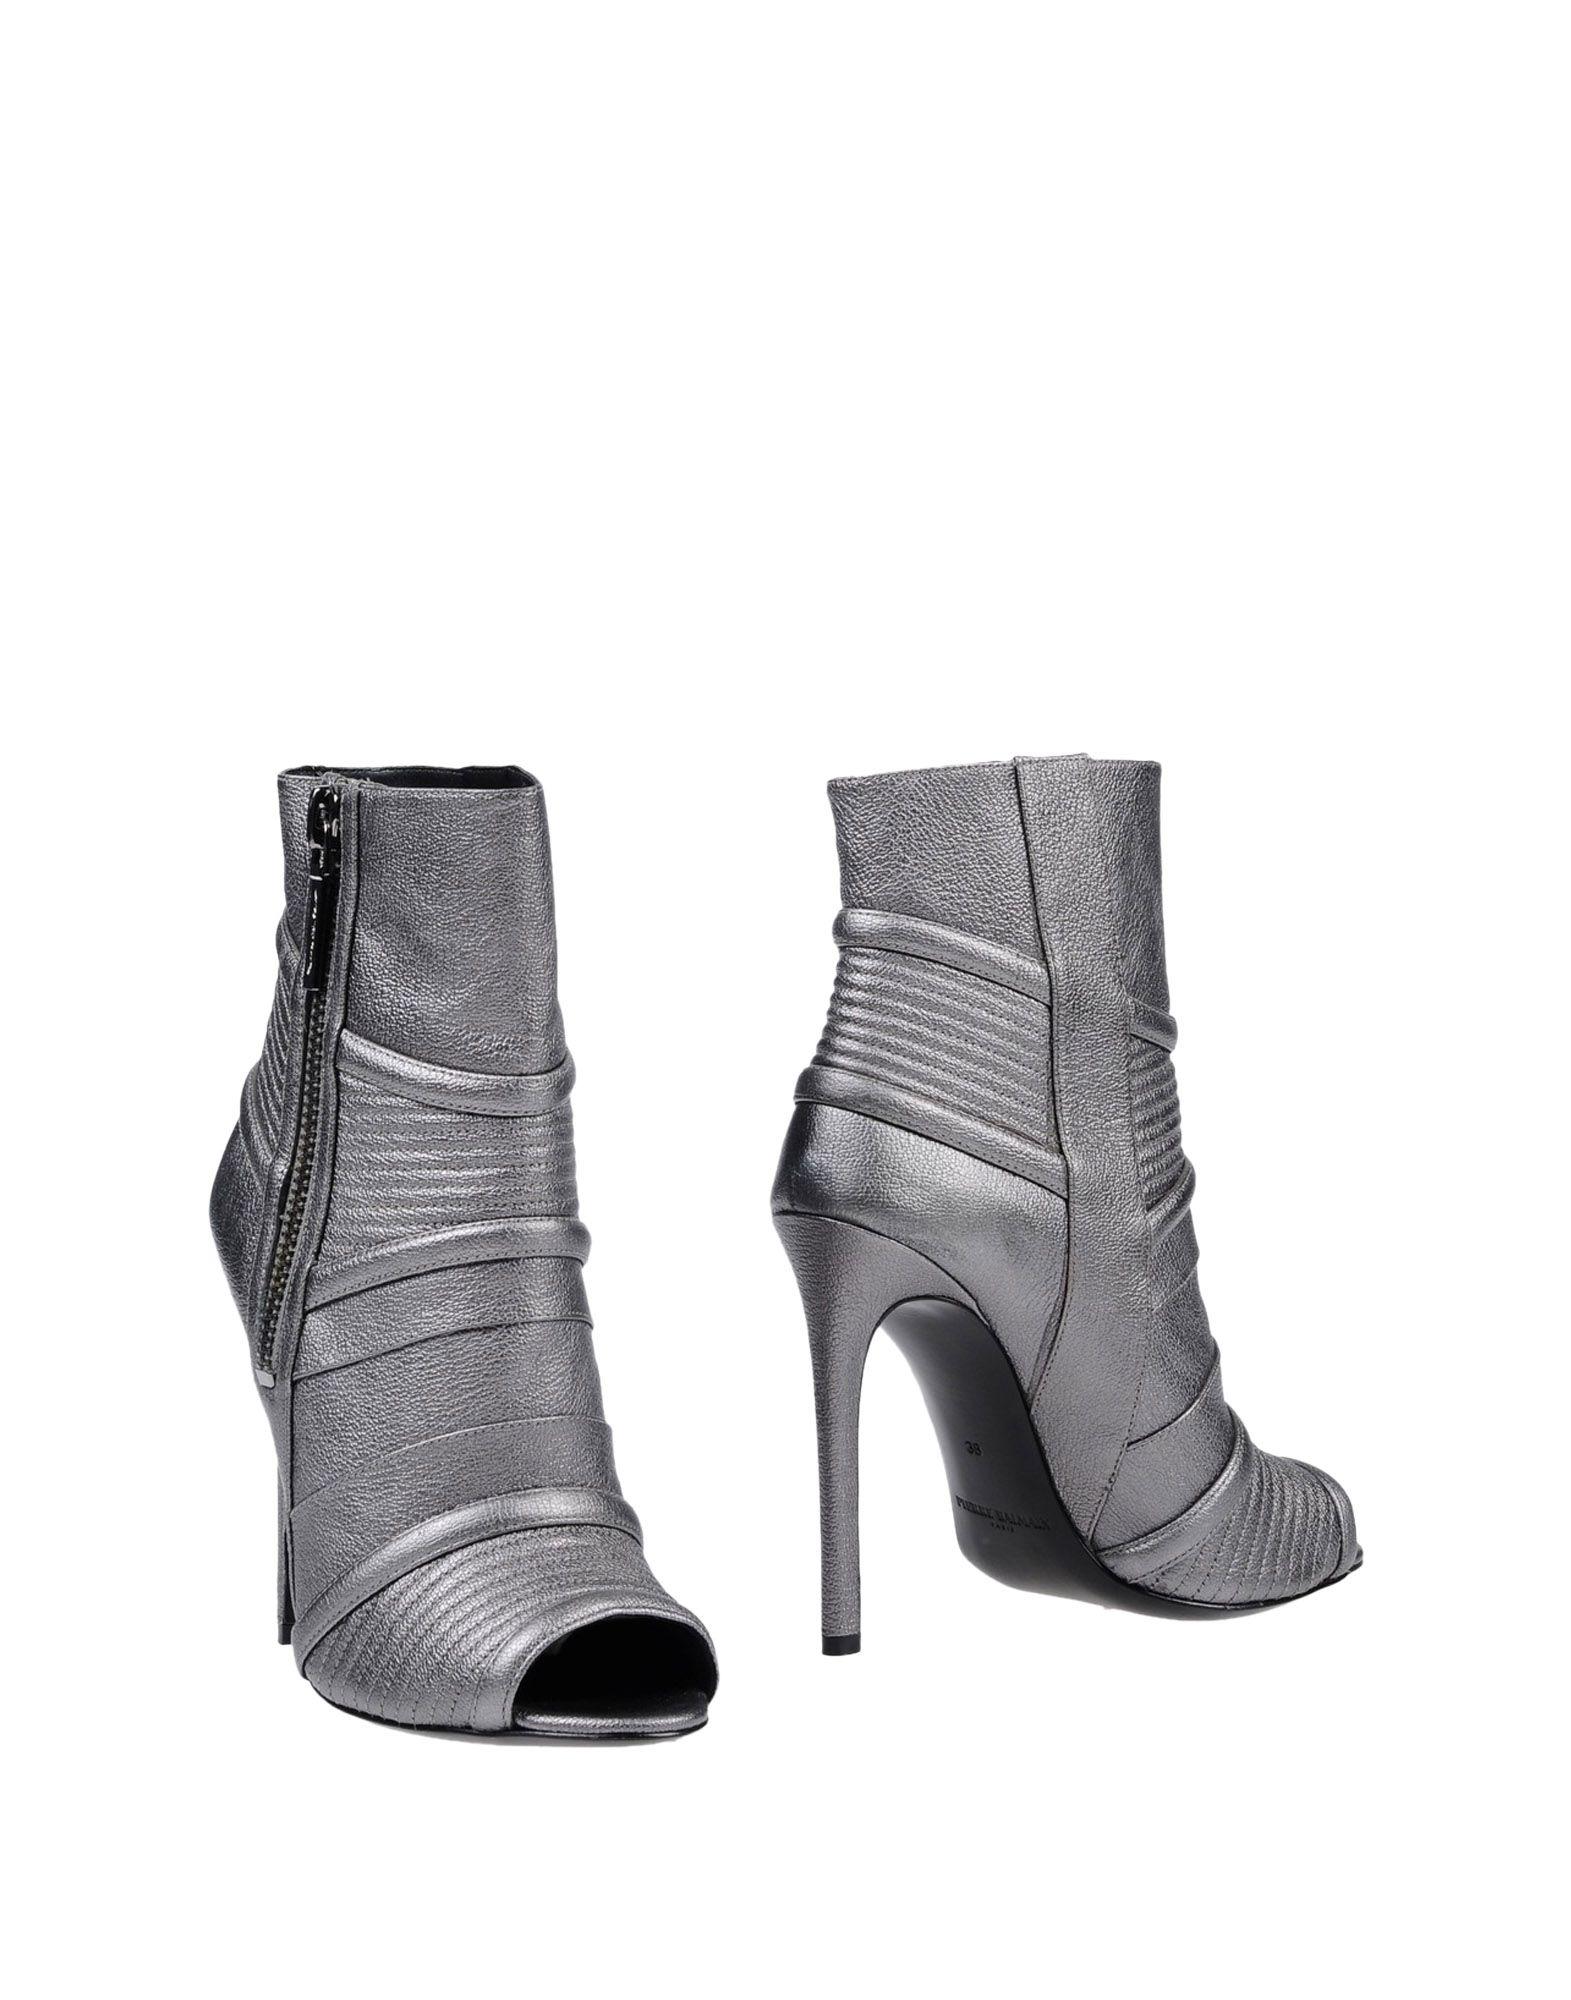 PIERRE BALMAIN Полусапоги и высокие ботинки pierre hardy полусапоги и высокие ботинки